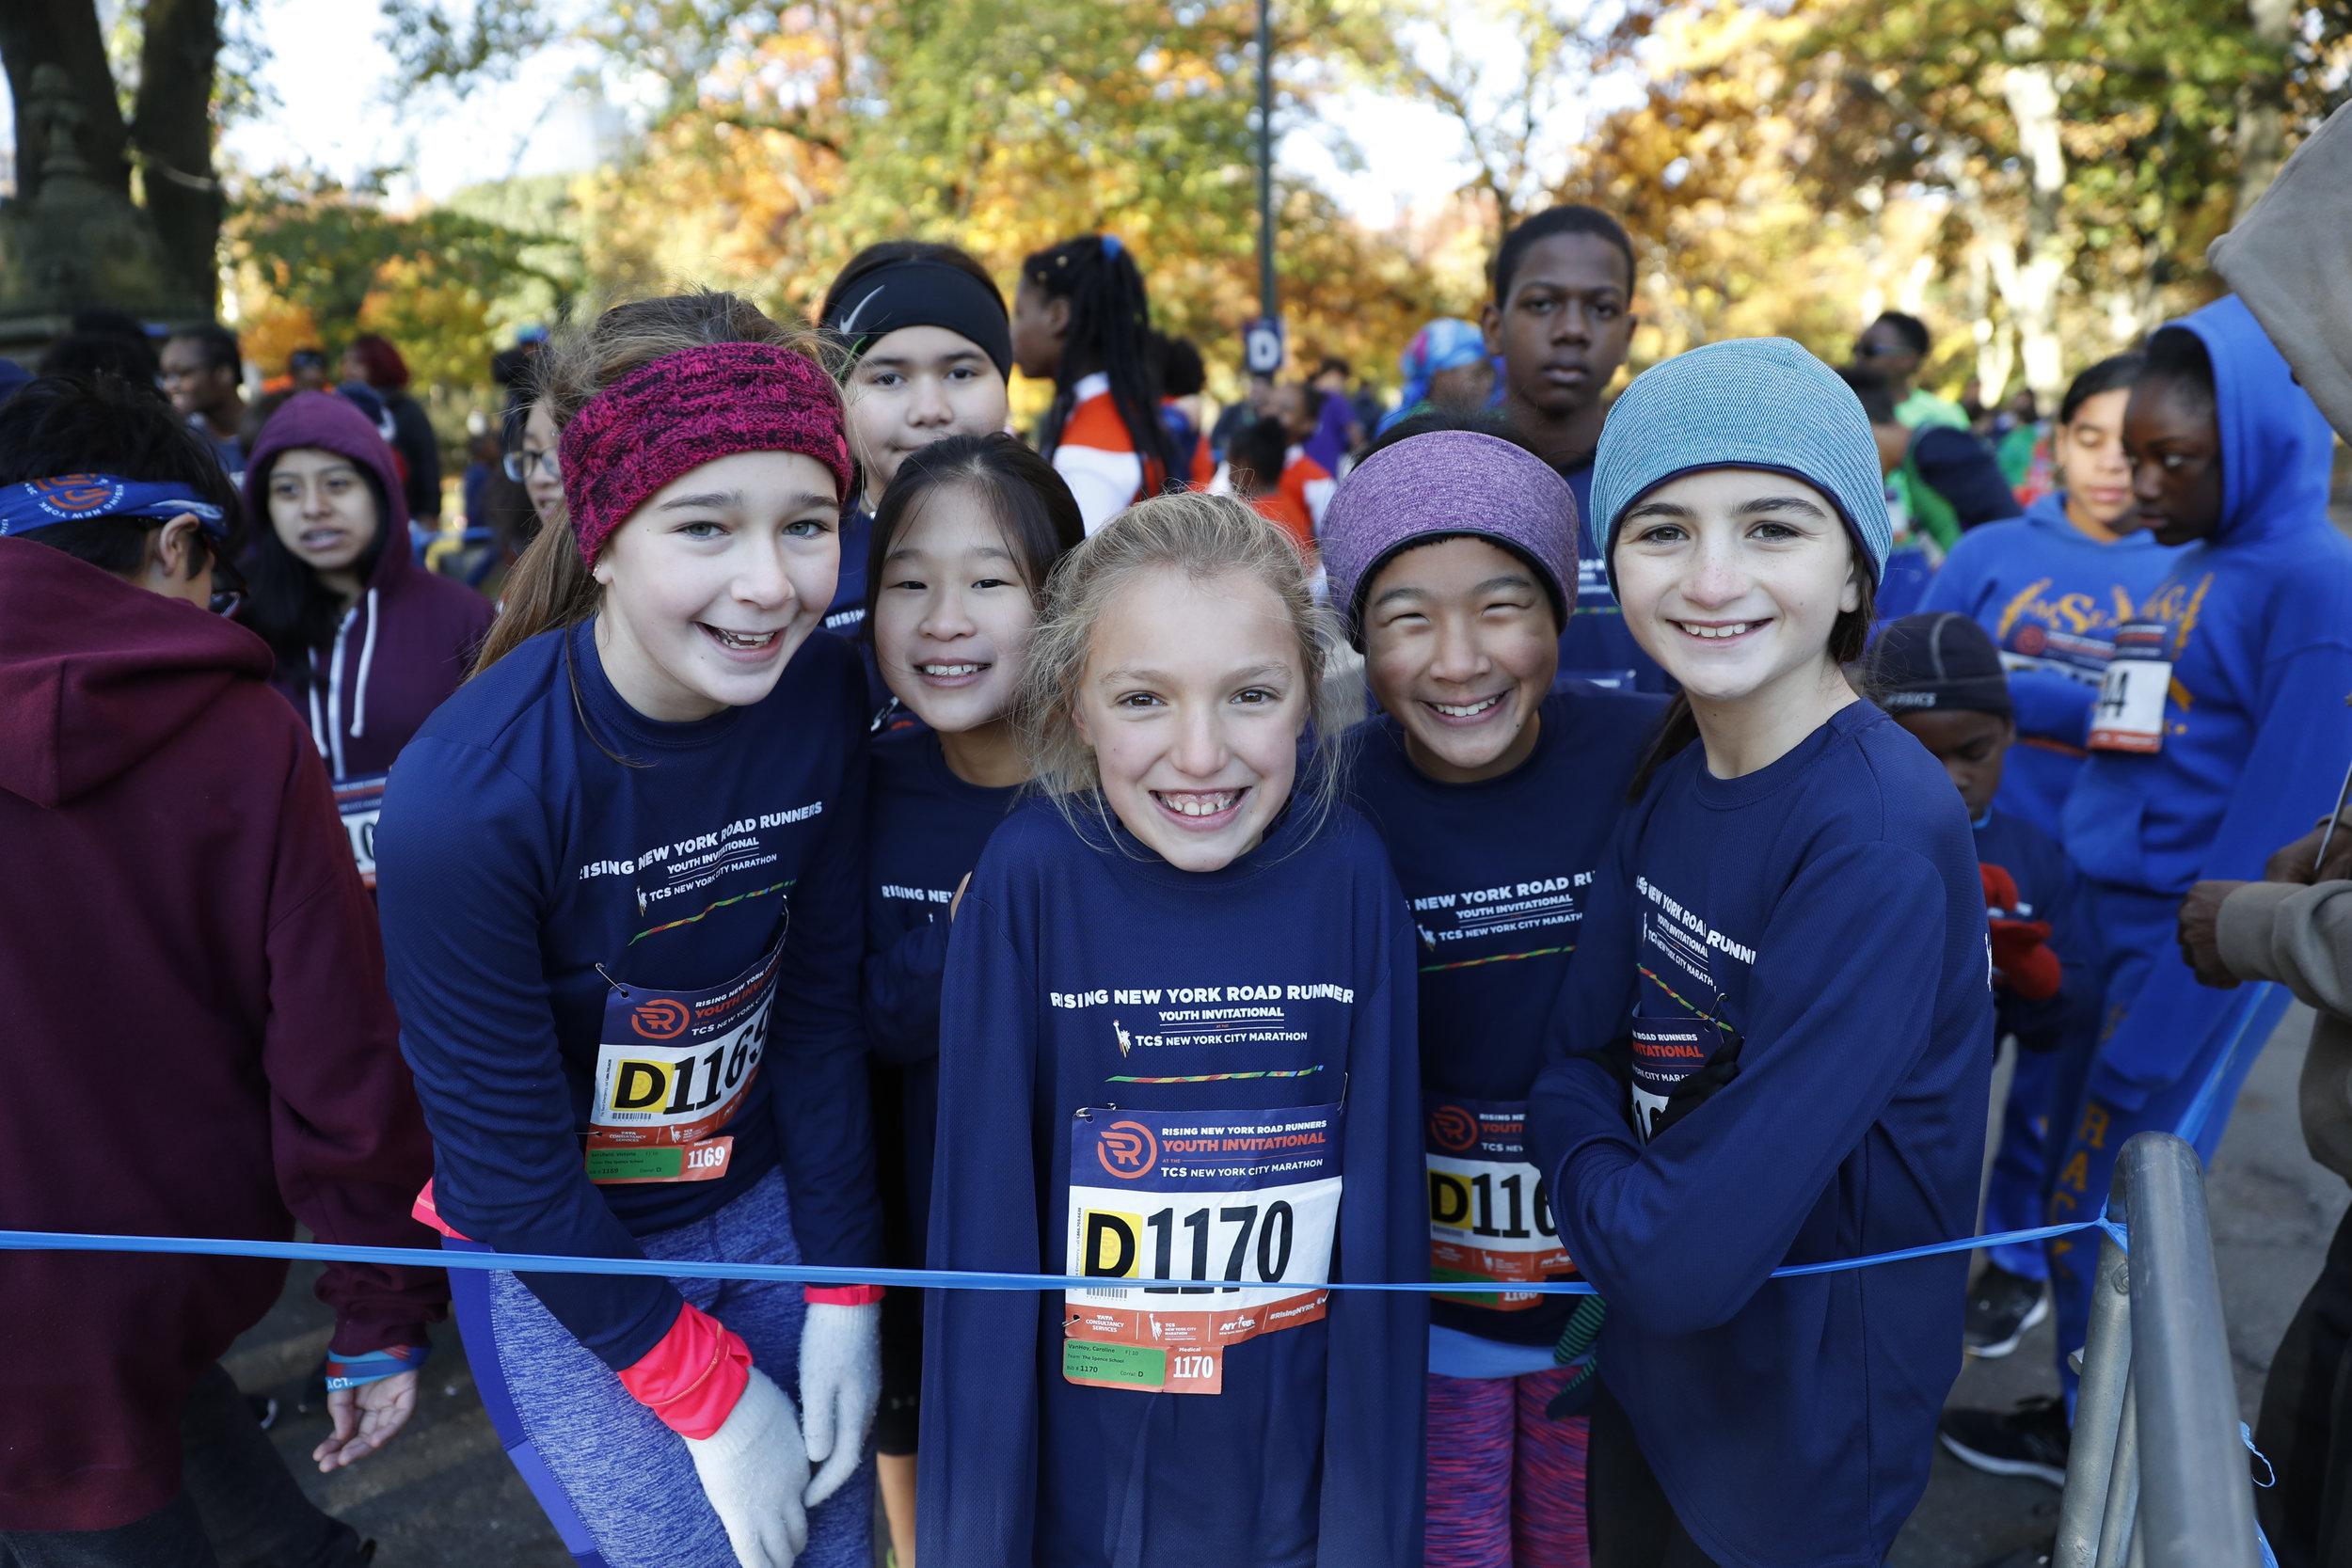 Rising New York Road Runners enjoying the festivities the week of the New York City Marathon